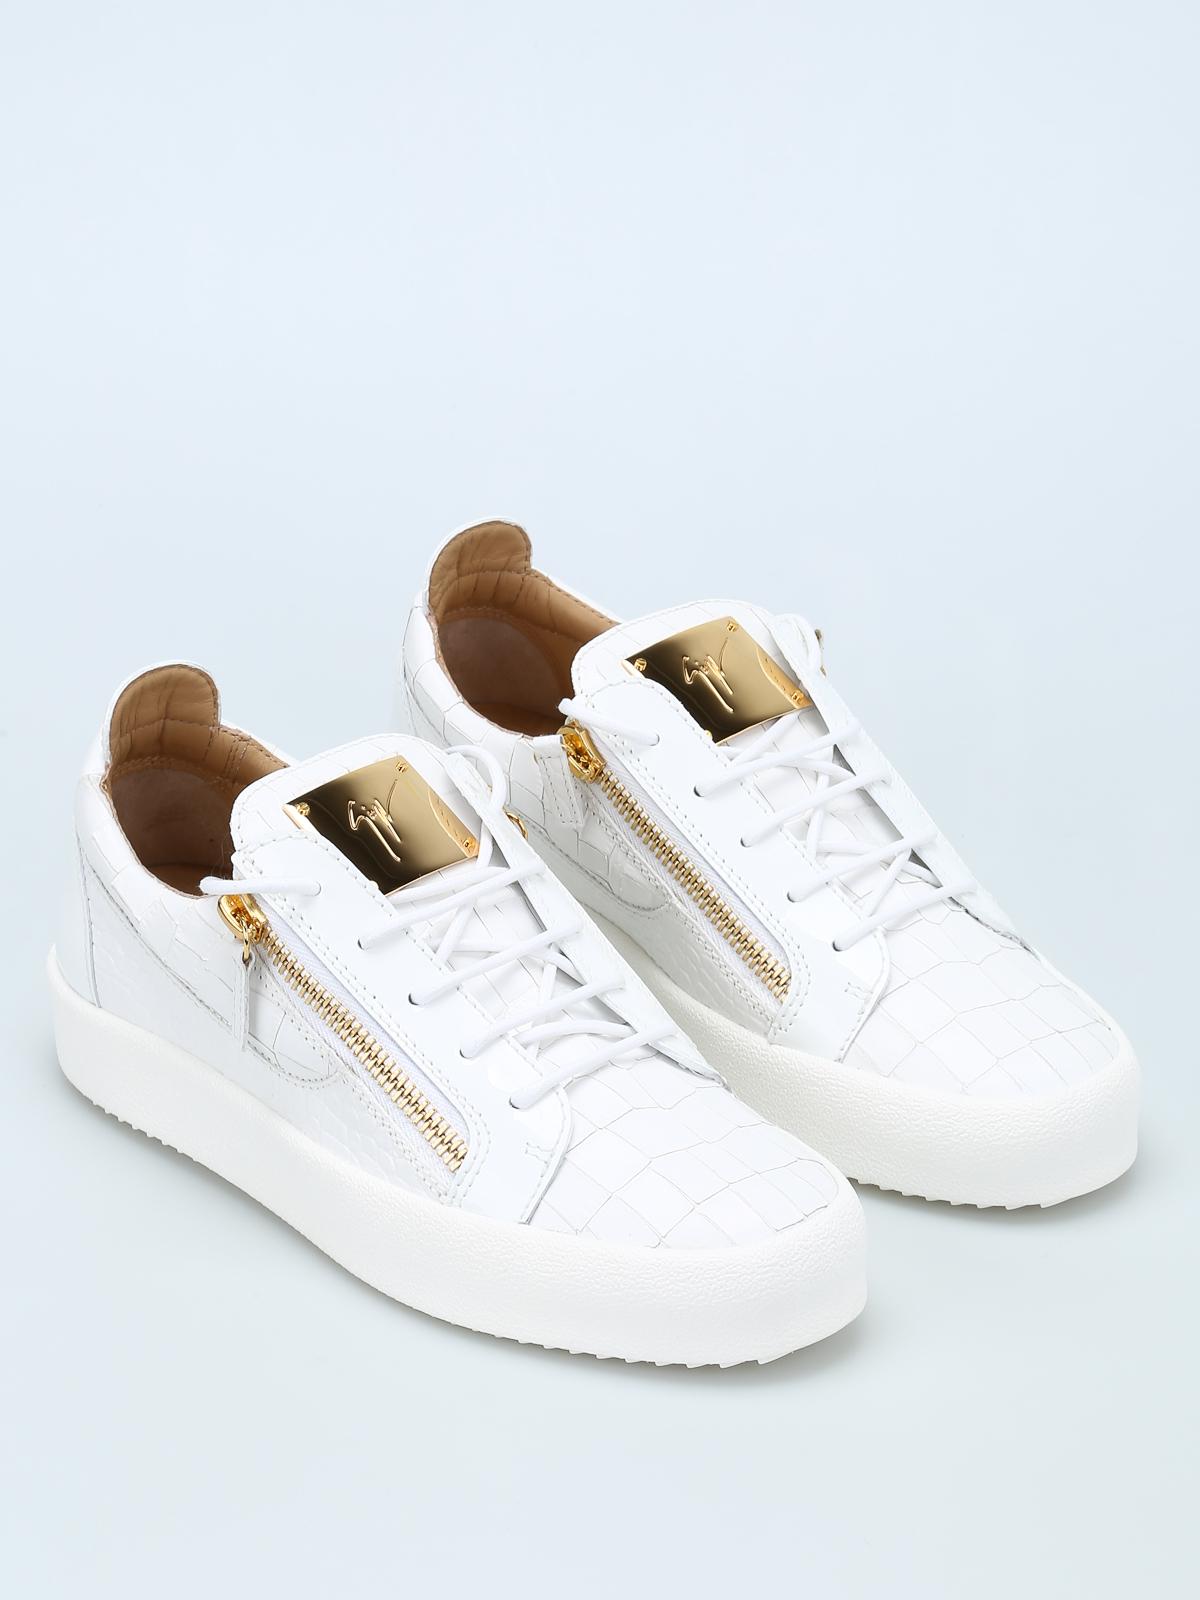 79c64aebd5b04 GIUSEPPE ZANOTTI: trainers online - May London croco print sneakers